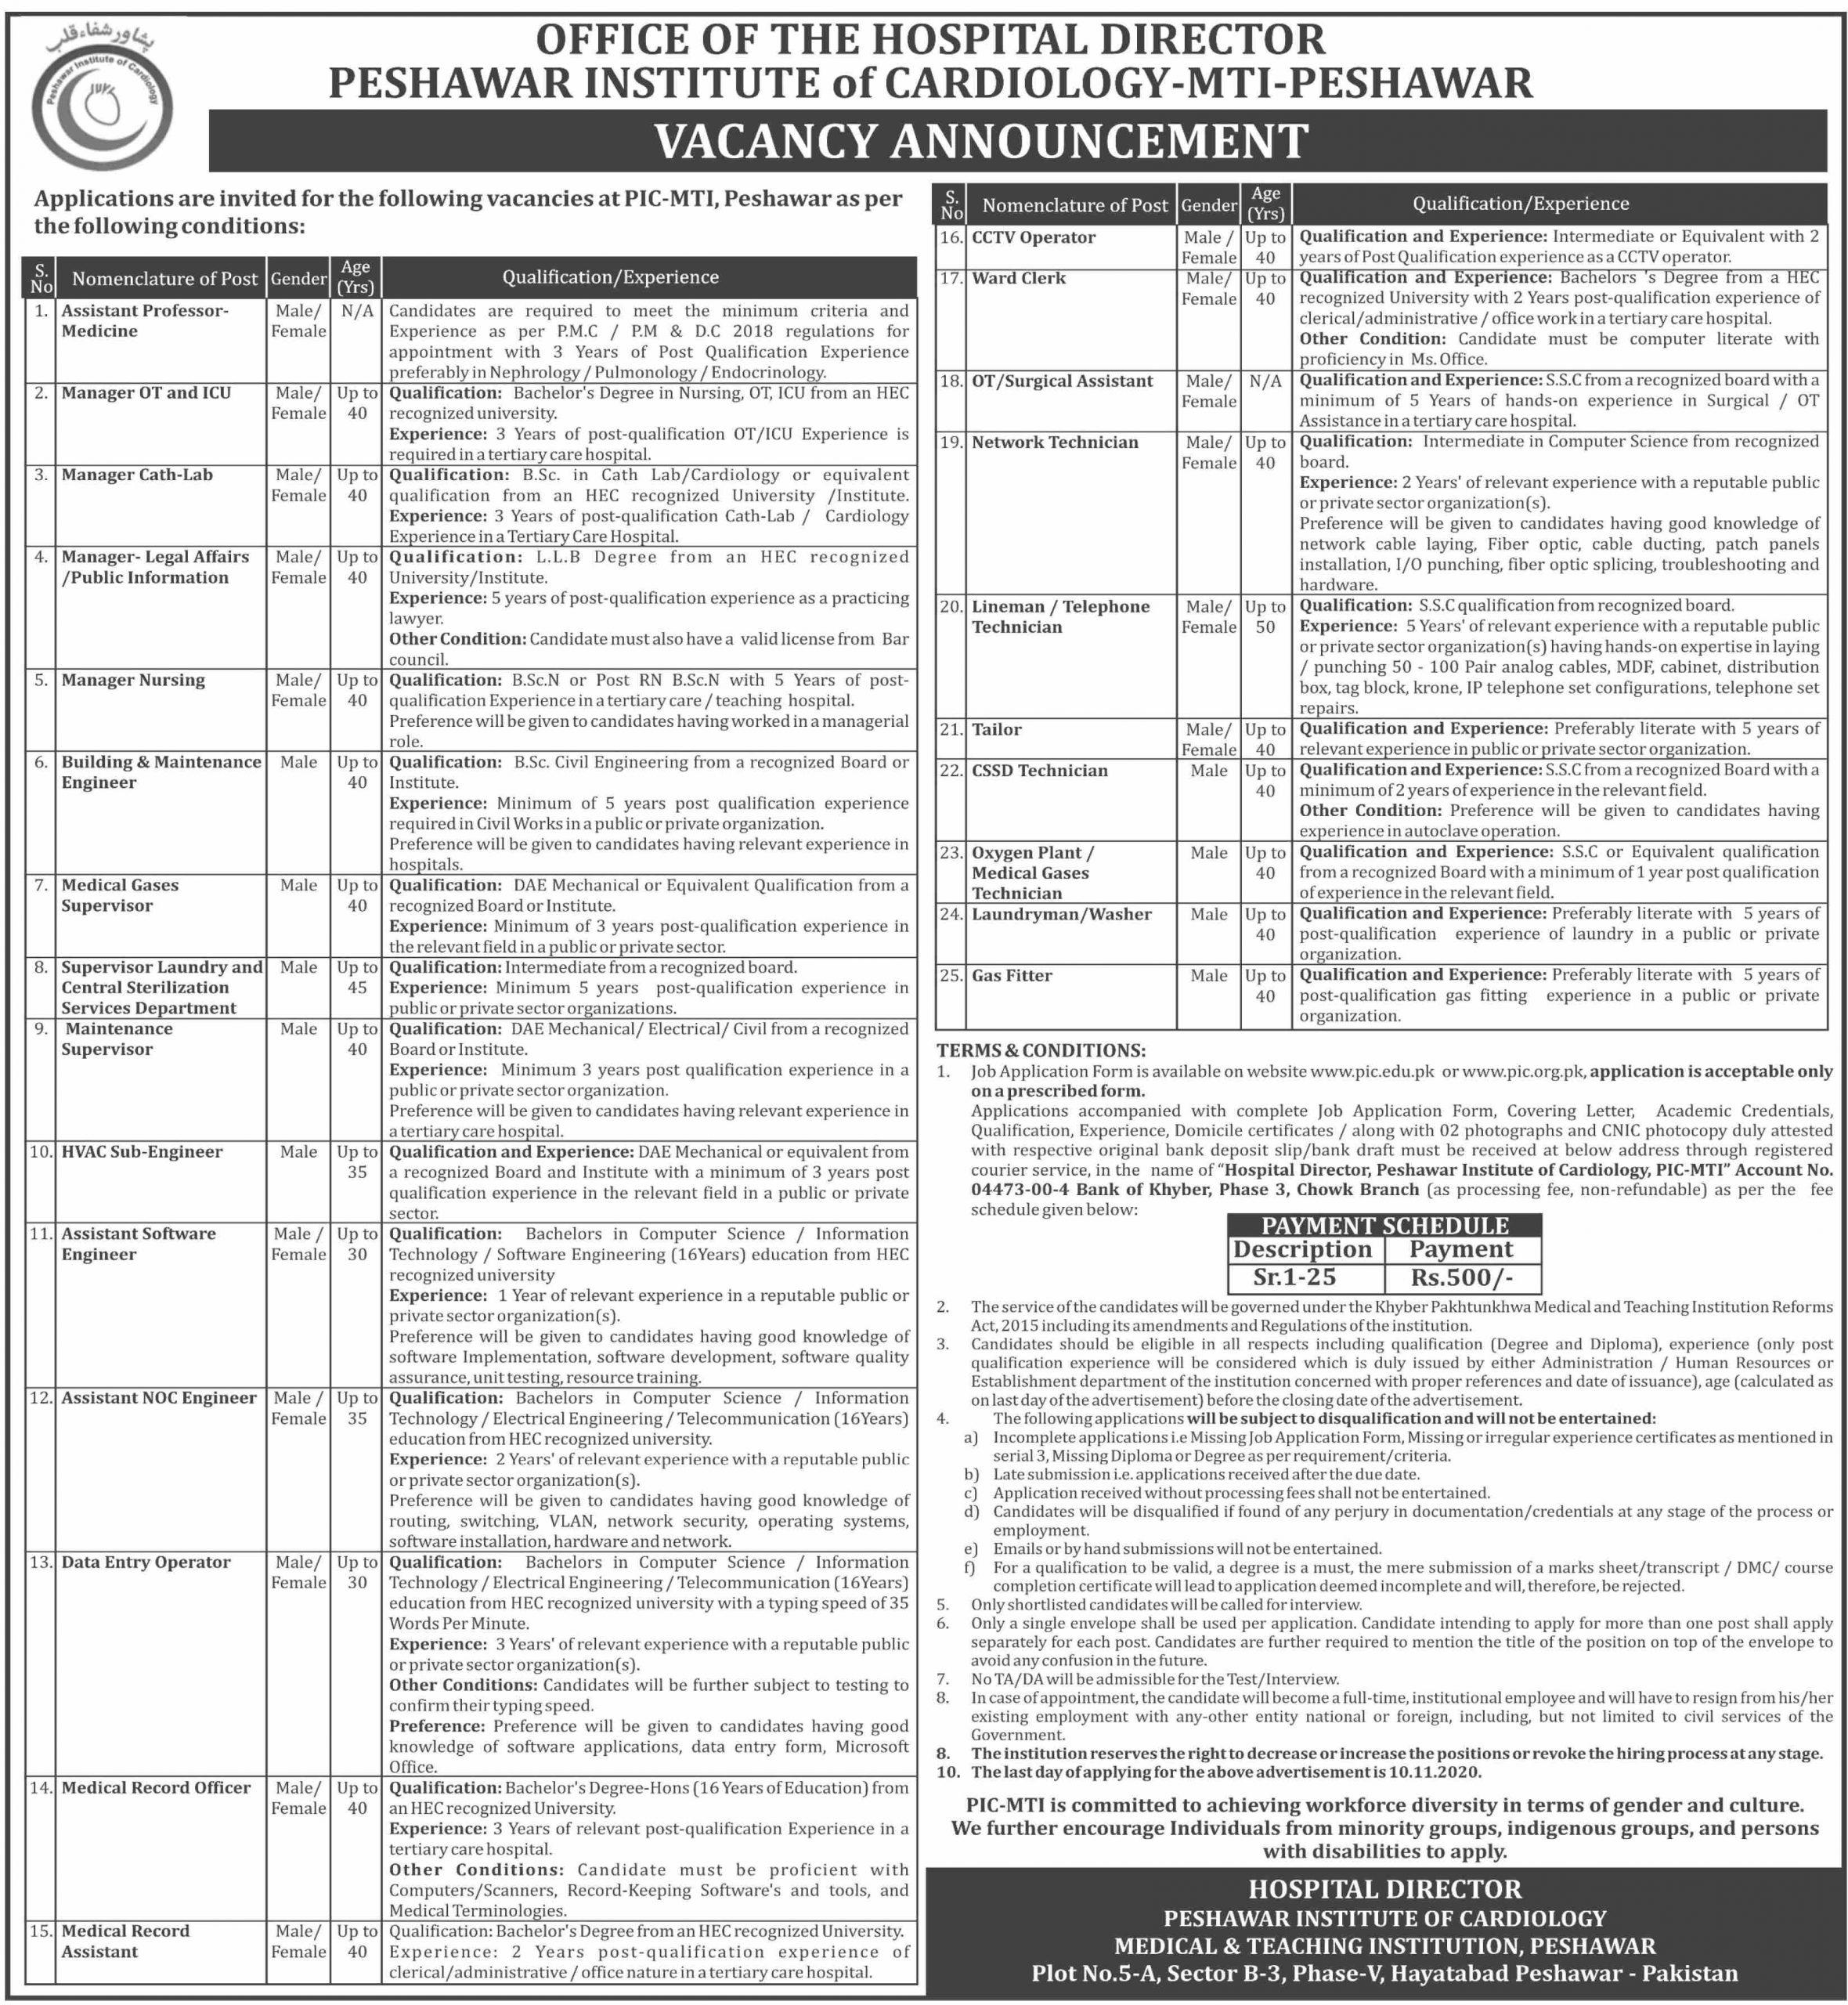 KPK Jobs in Peshawar Institute of Cardiology